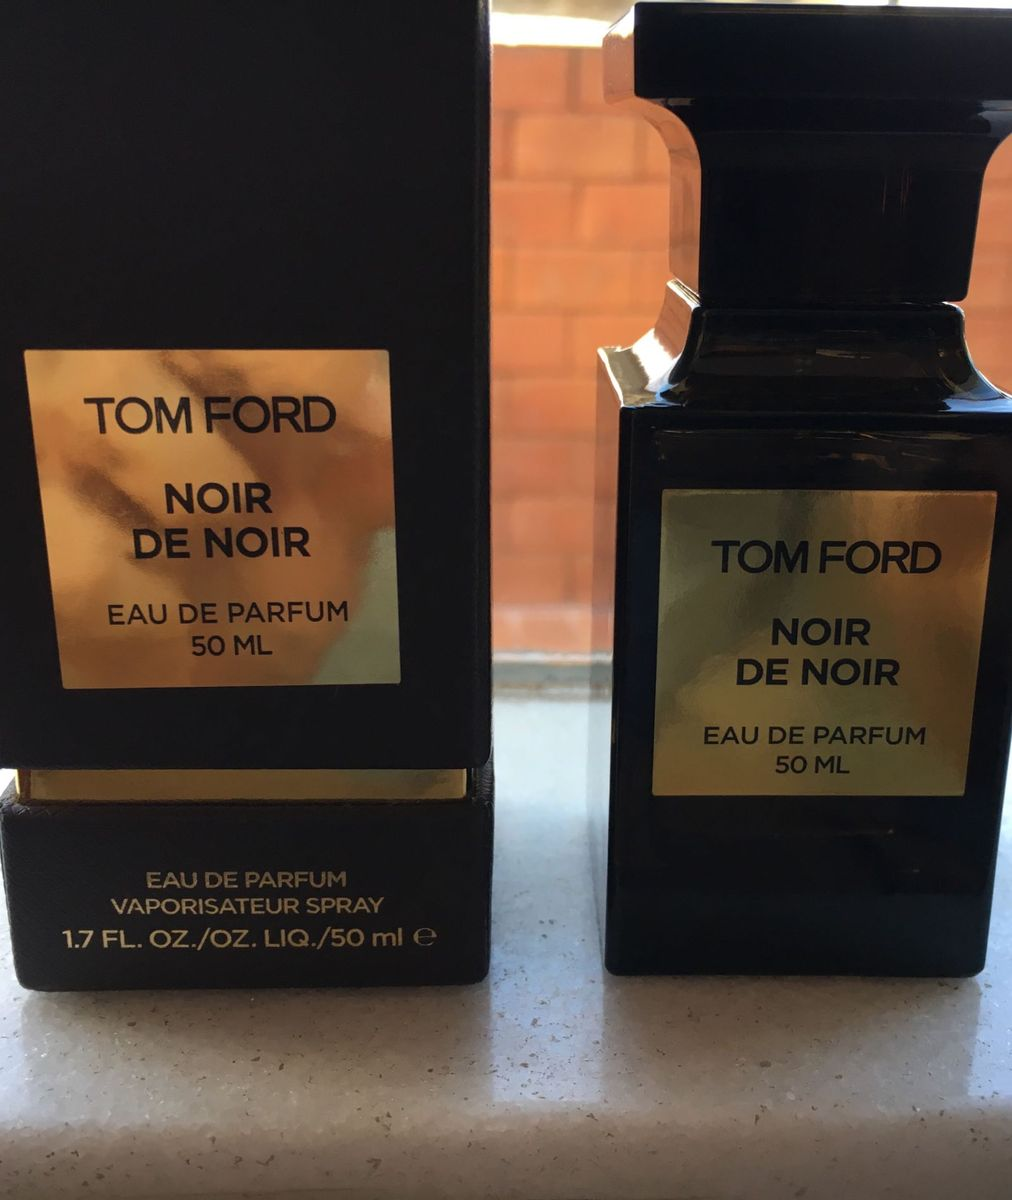 aa15b32081949 perfume tom ford noir de noir - perfumes tom ford.  Czm6ly9wag90b3muzw5qb2vplmnvbs5ici9wcm9kdwn0cy83mzk4mjuvmtjinzzjnwm4ntgxmthjodjmyzdmngnkodmzndg4nwiuanbn  ...